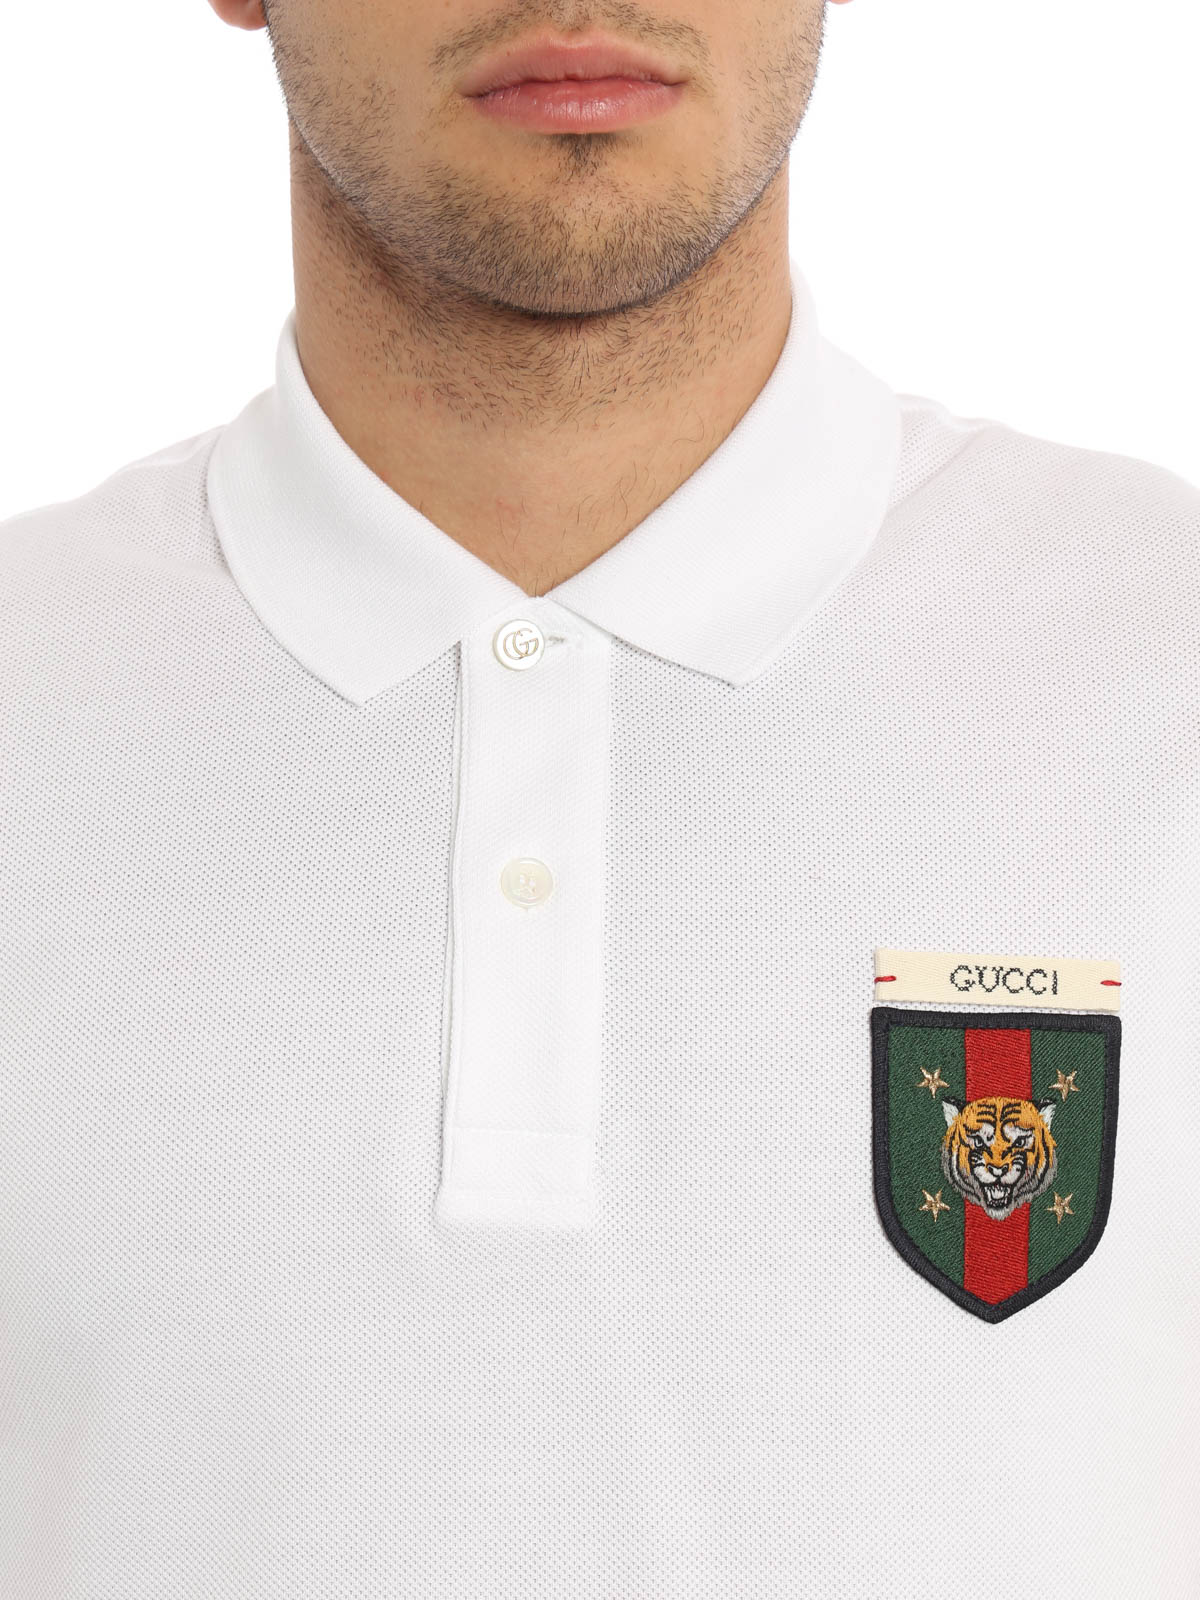 2adada9f5 Gucci - Web detail and tiger polo shirt - polo shirts - 408322 X5H61 ...